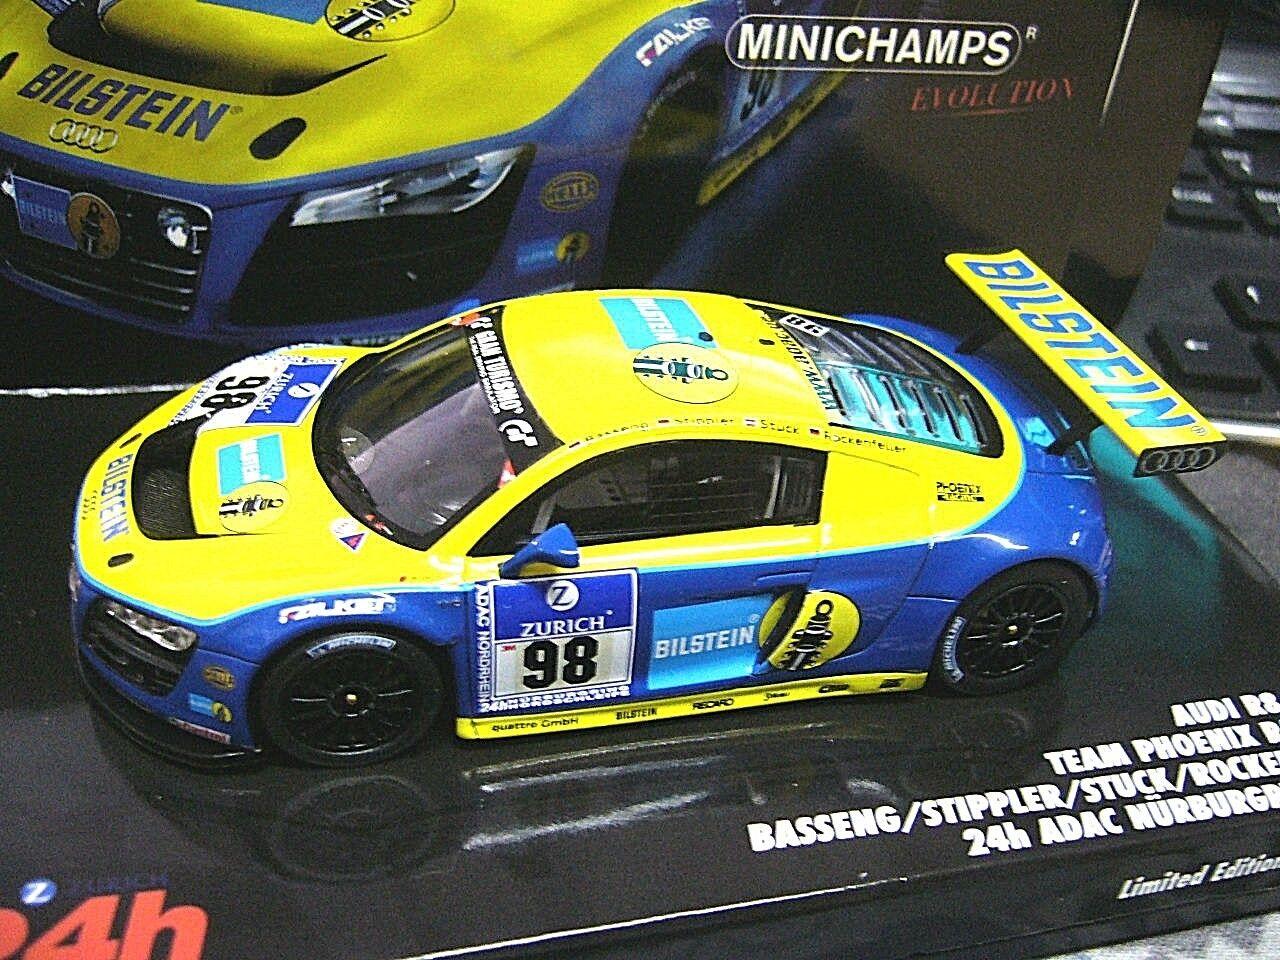 Audi r8 LMS 24 H Bilstein Nurburgring 2010 stuc Stippler RO  98 MINICHAMPS 1 43